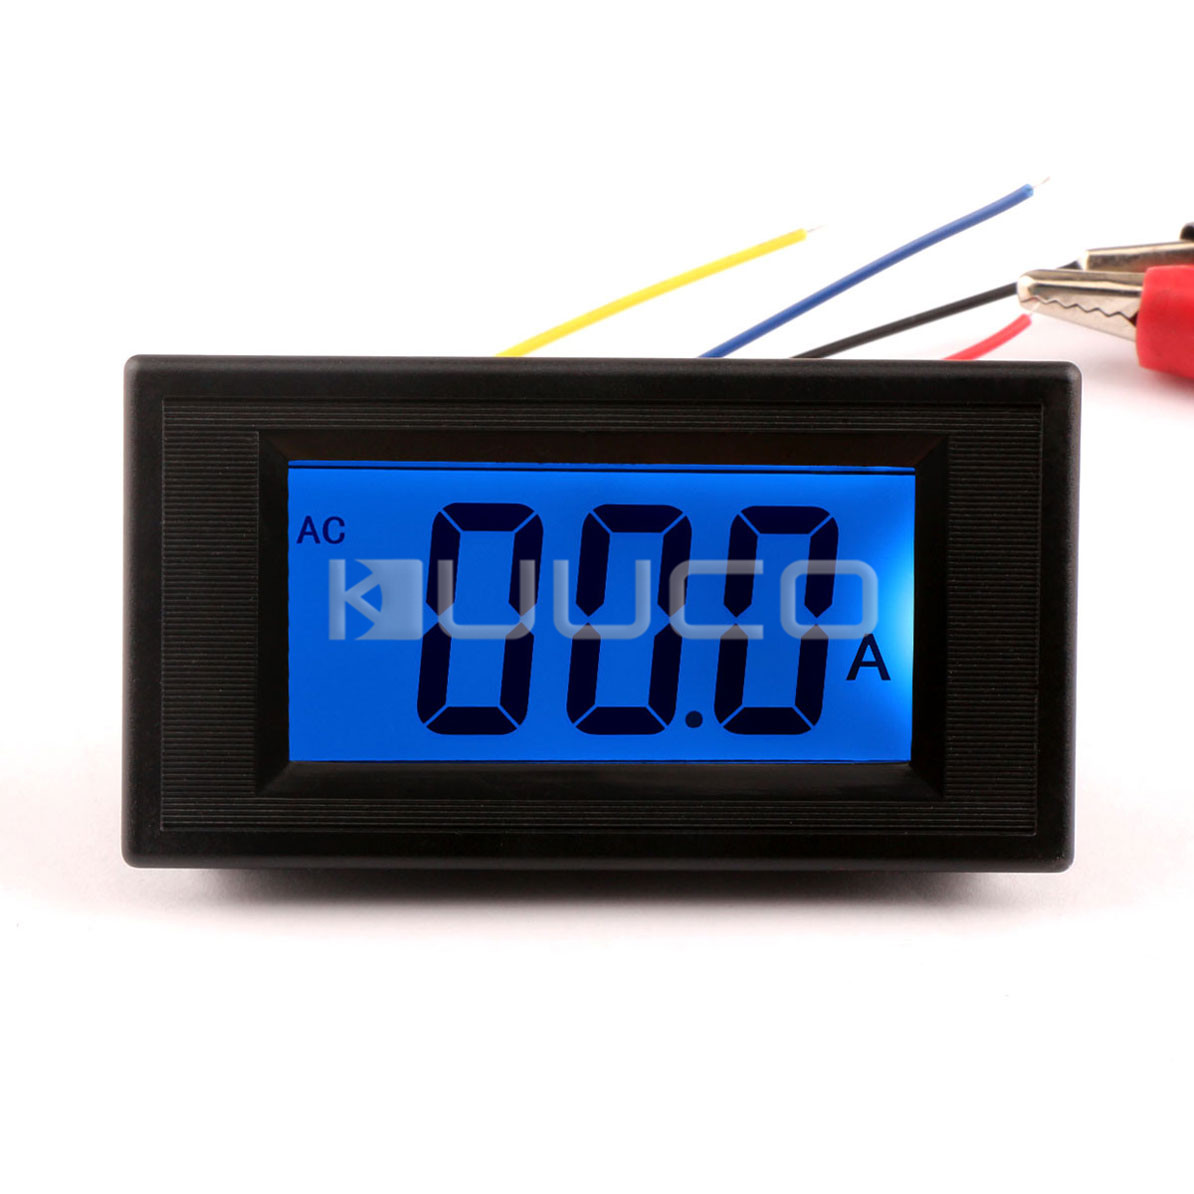 Digital Current Meter : Digital tester lcd ammeter ac a current